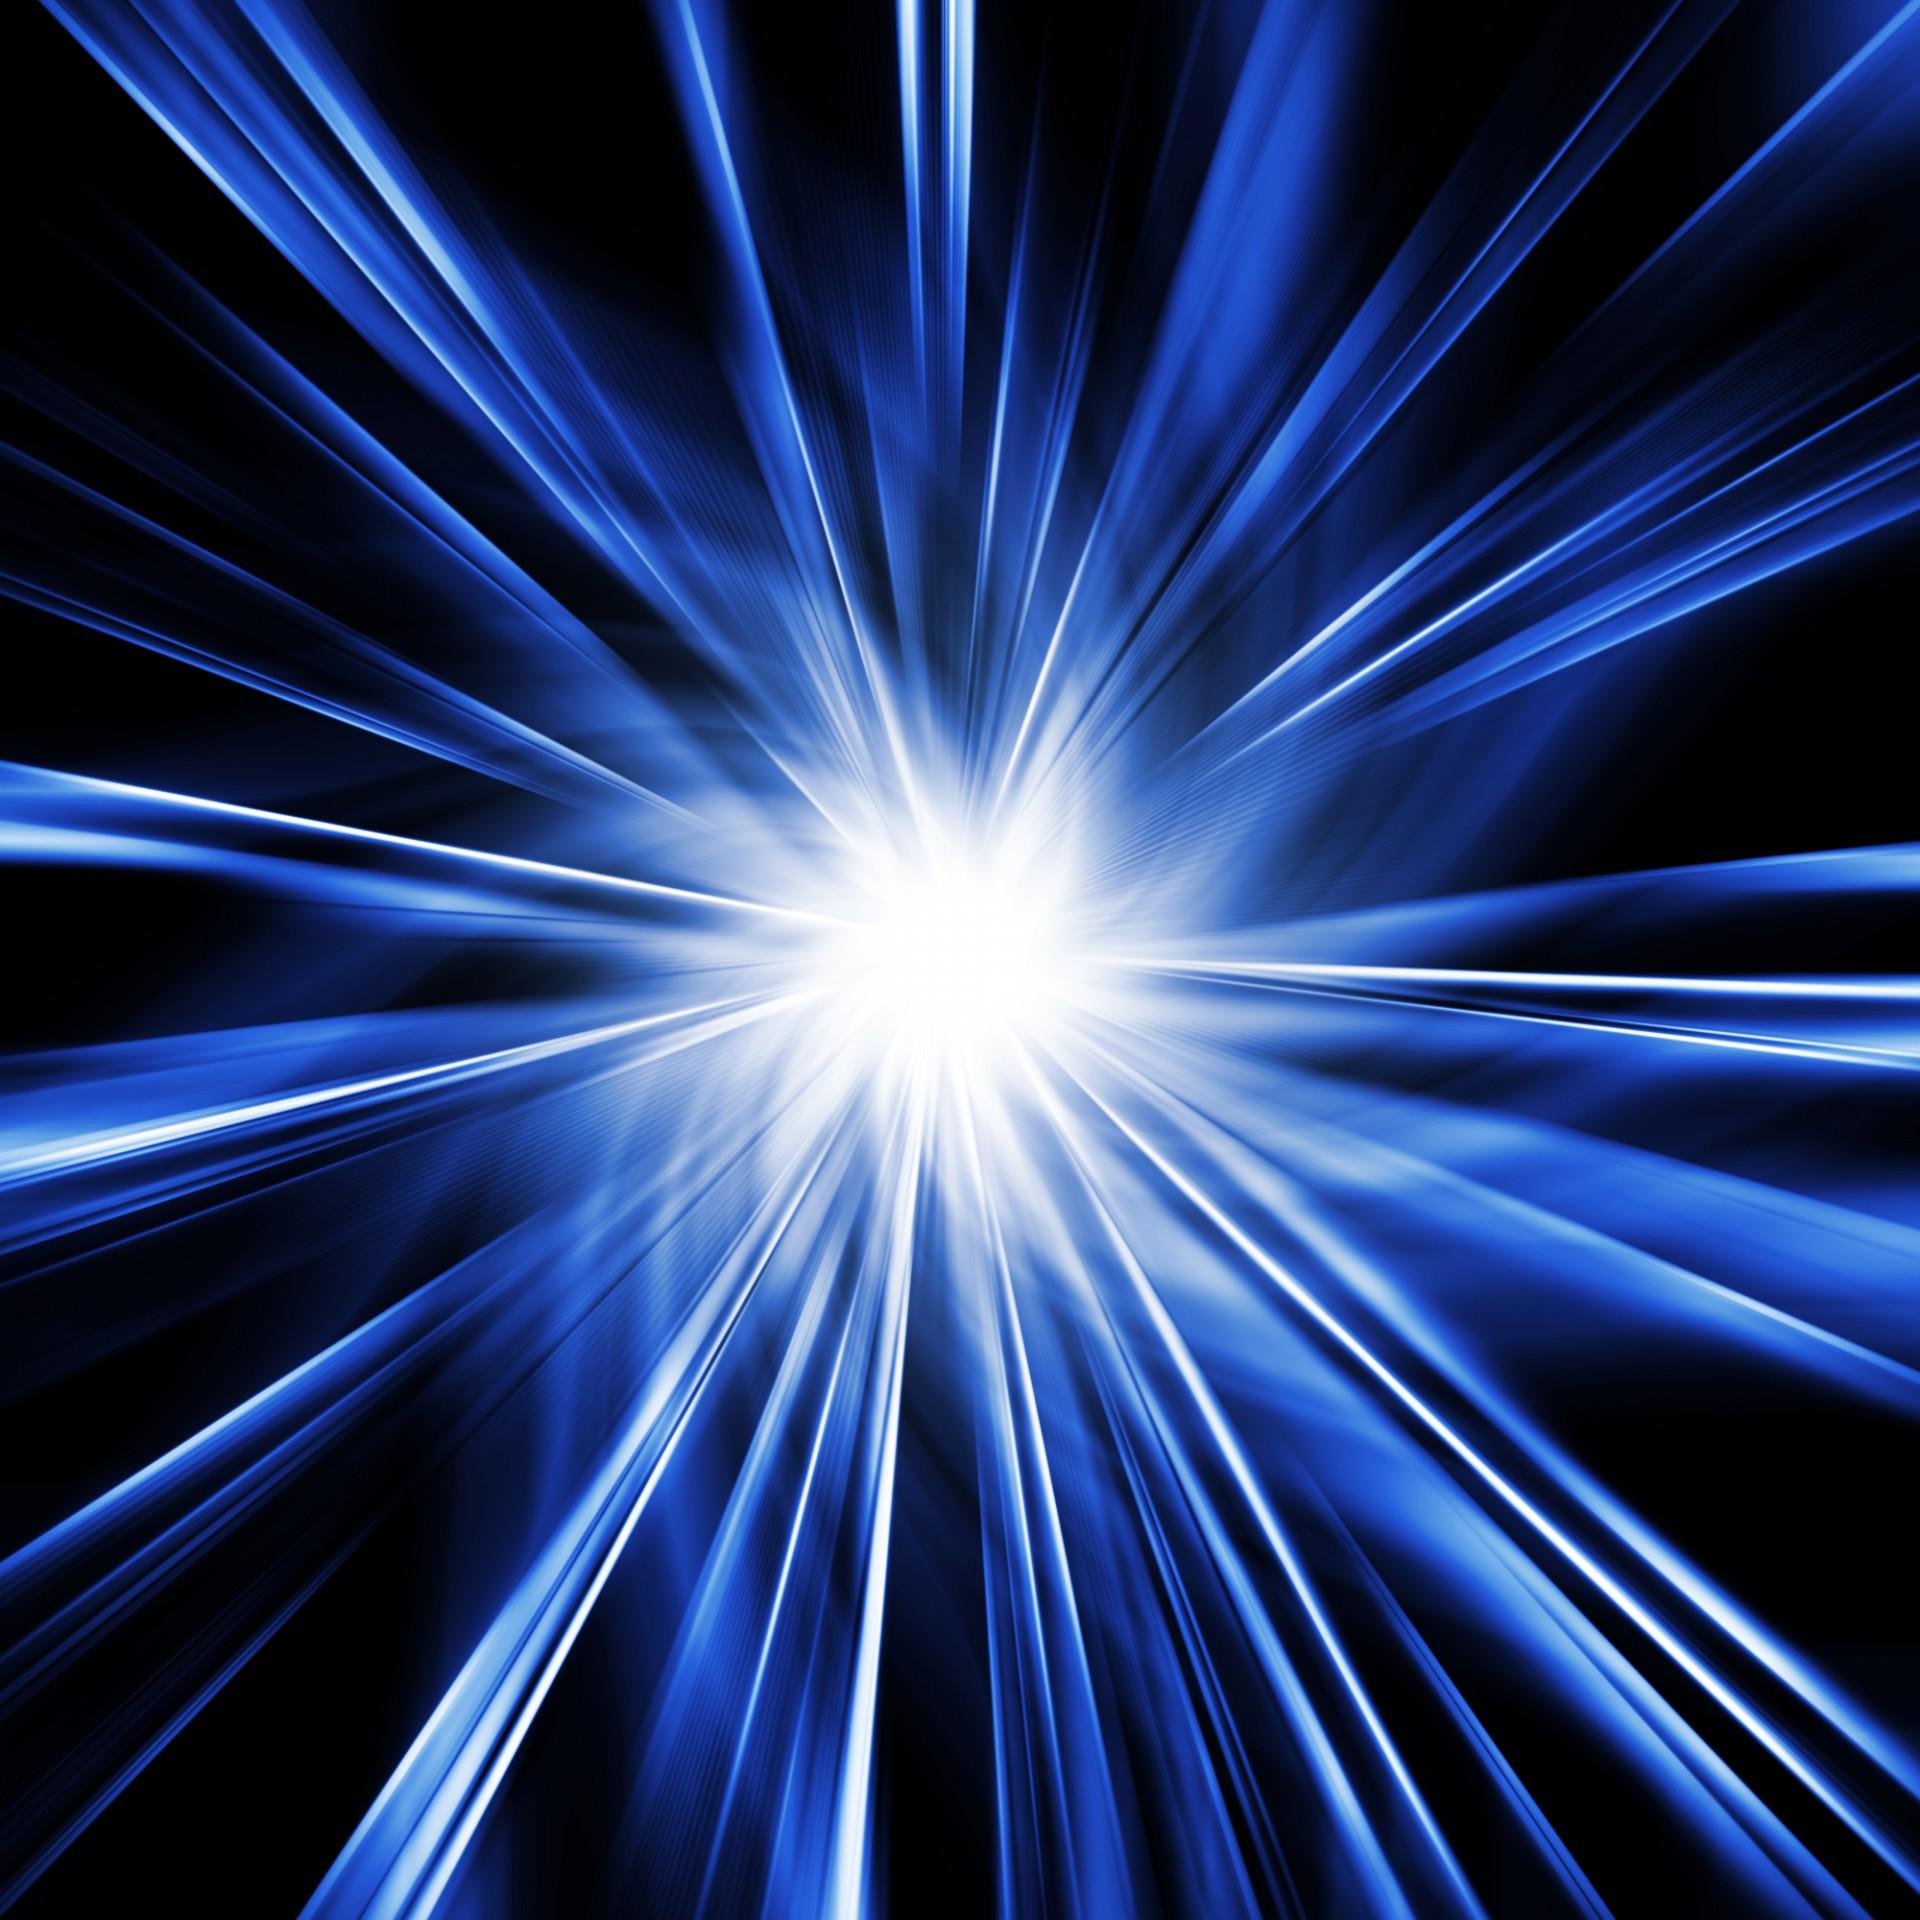 Blue Starburst Free Stock Photo - Public Domain Pictures